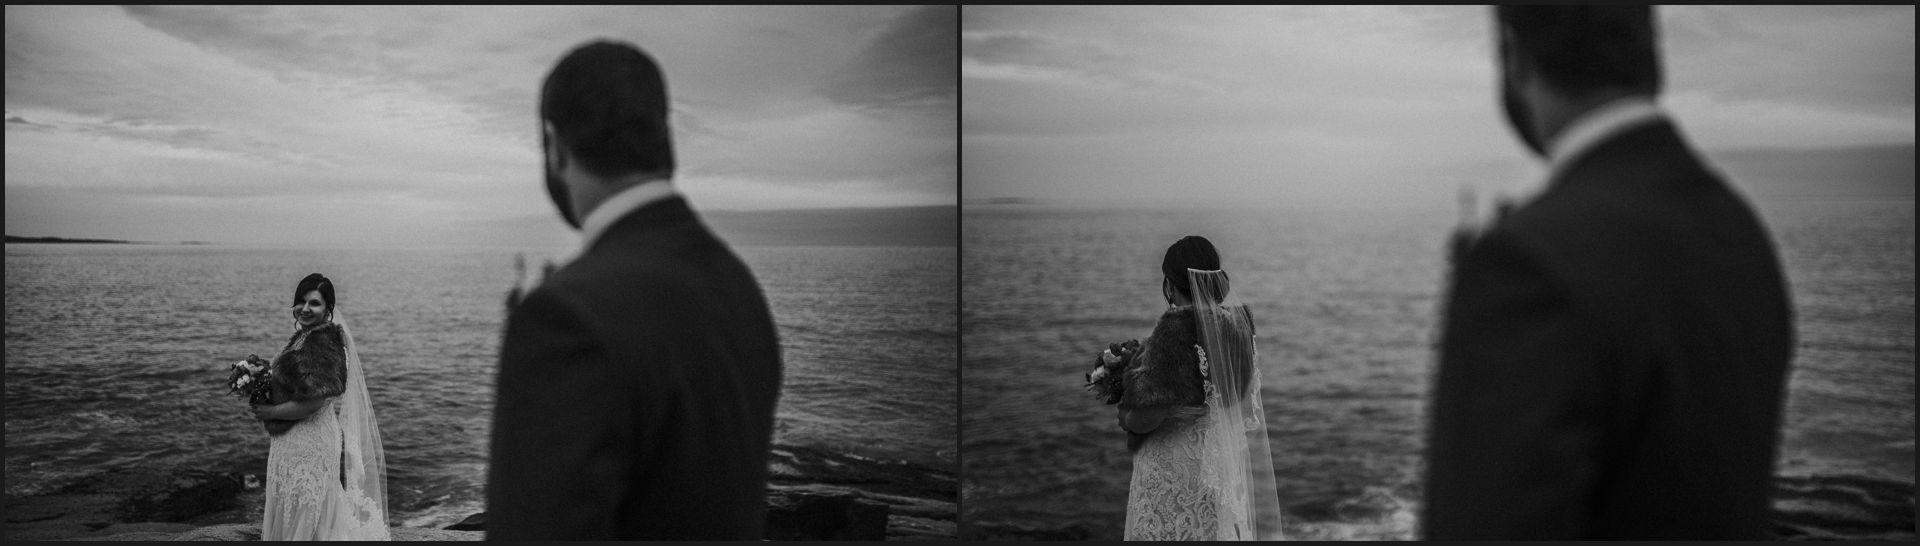 bride, groom, bar harbor, maine wedding, black and white, landscape